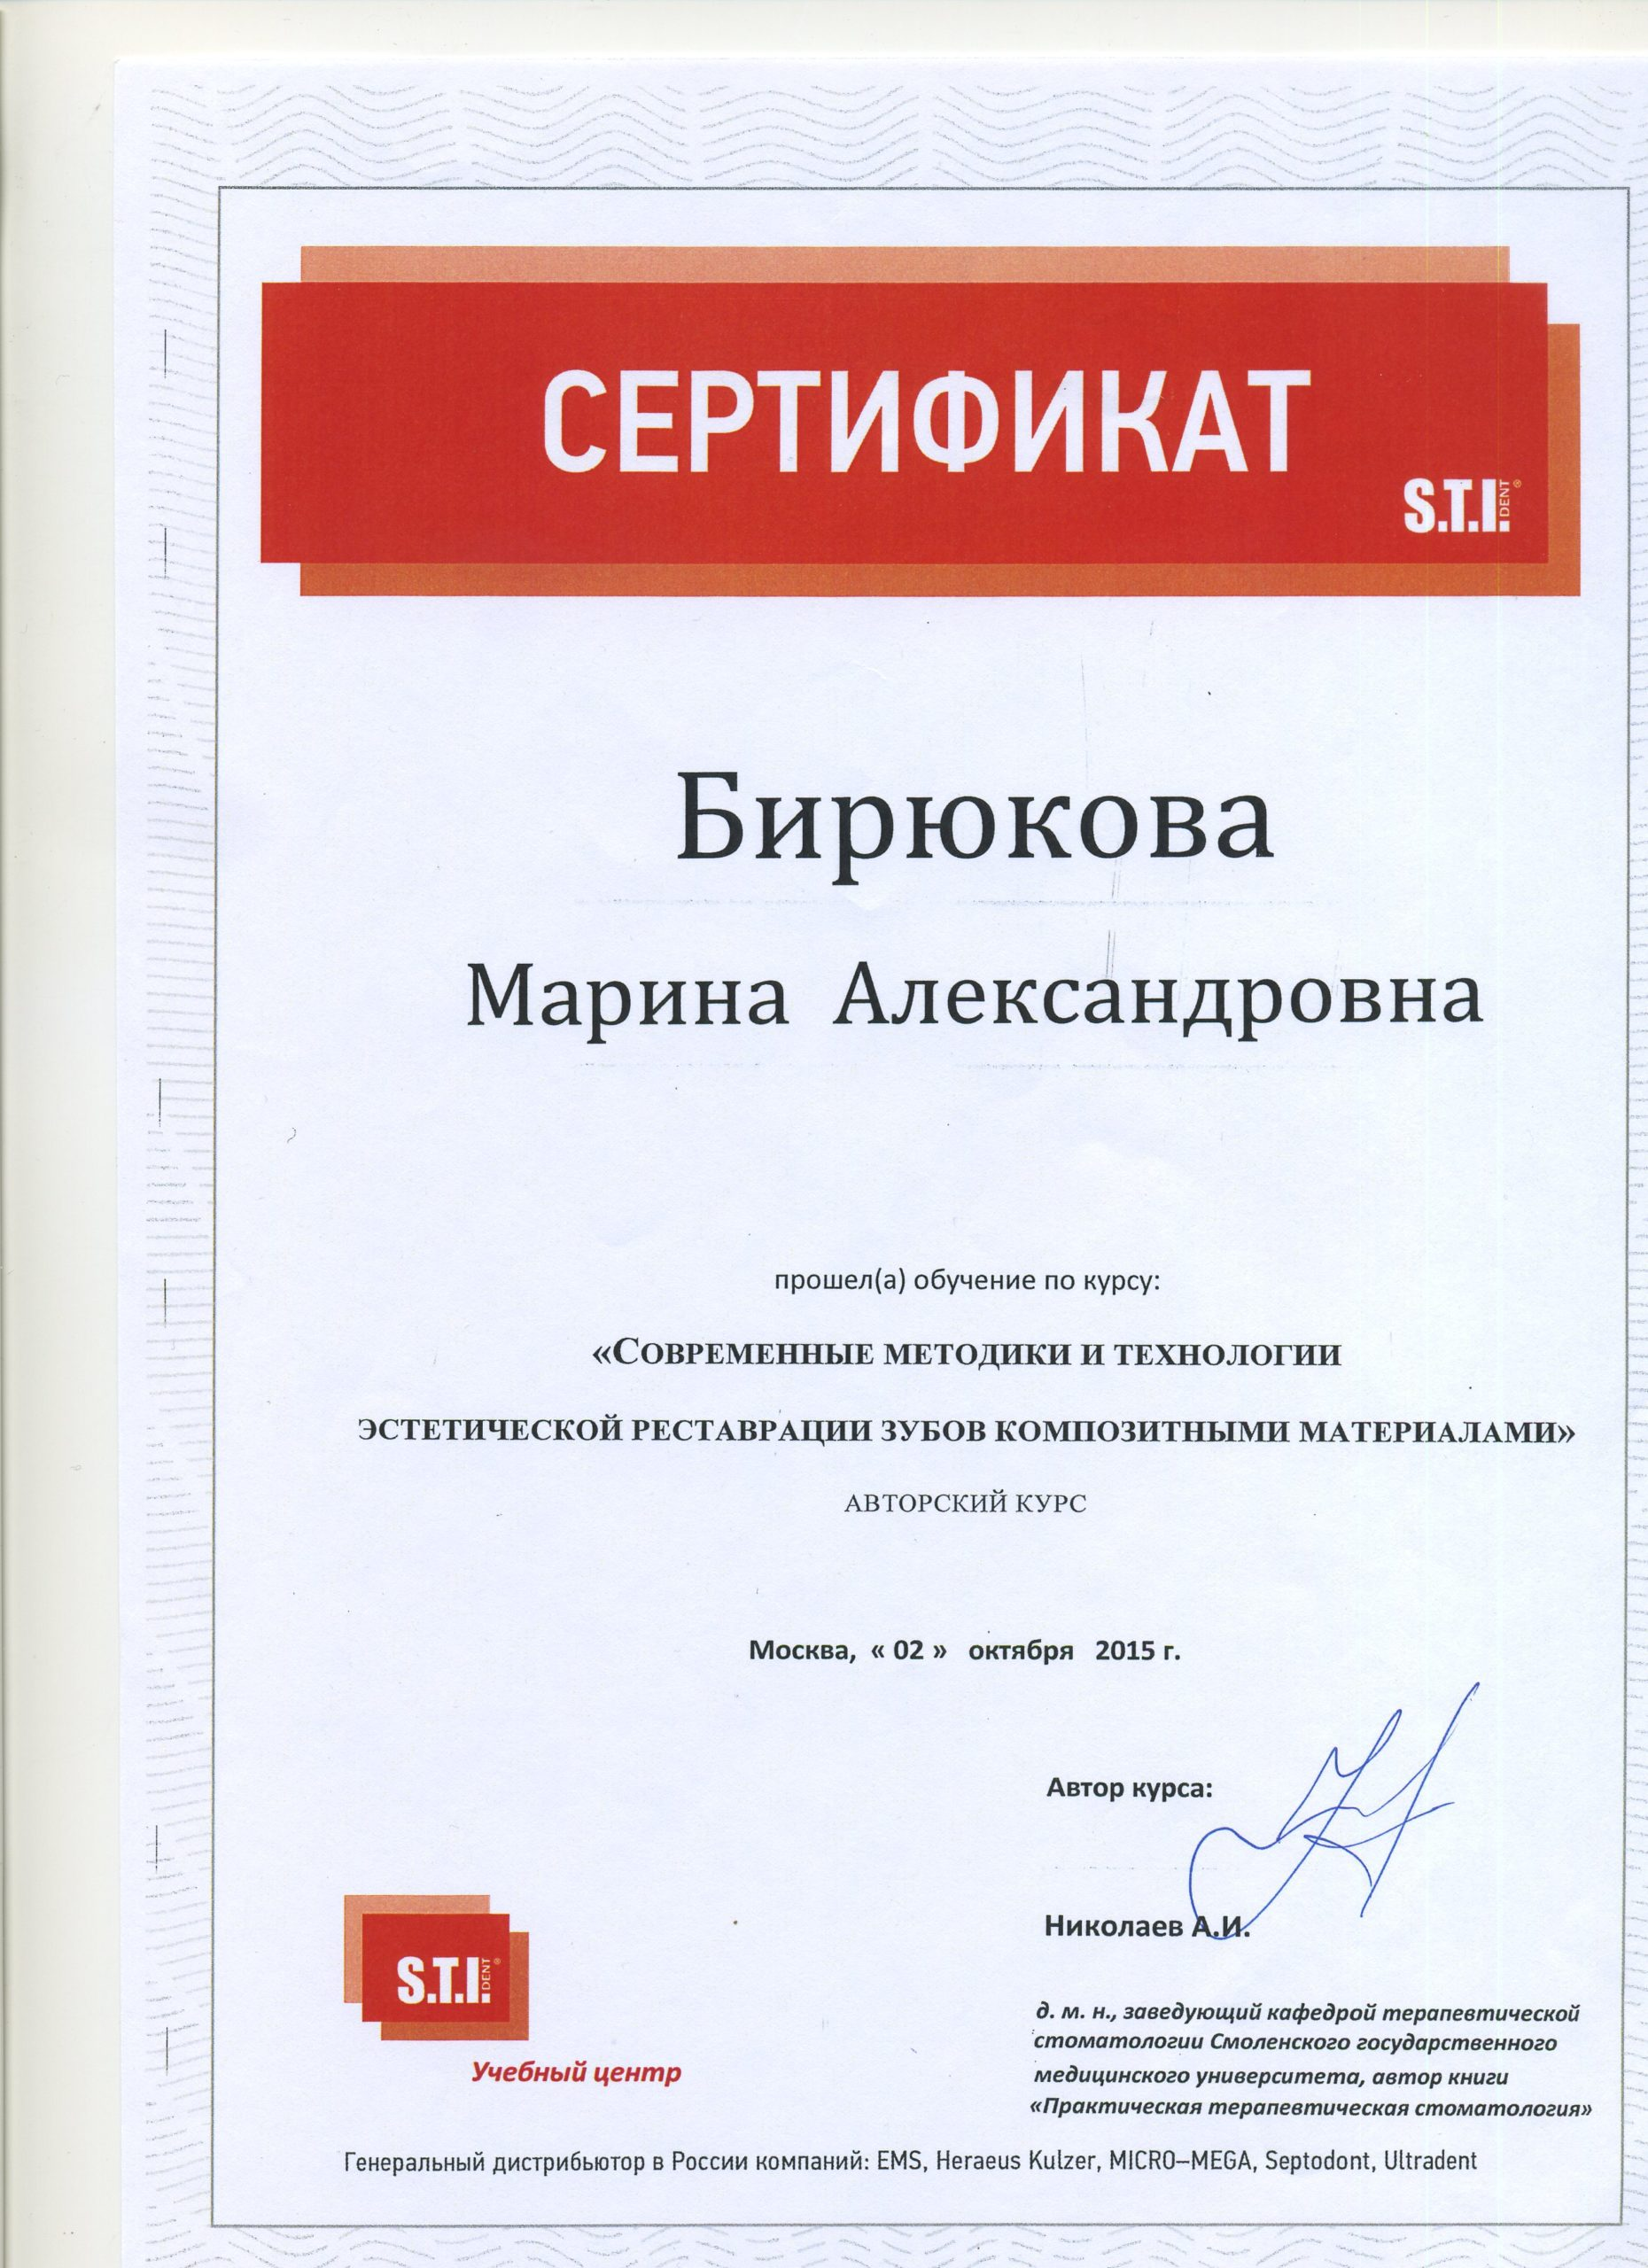 Сертифиат Жилеткова Марина Александровна_13